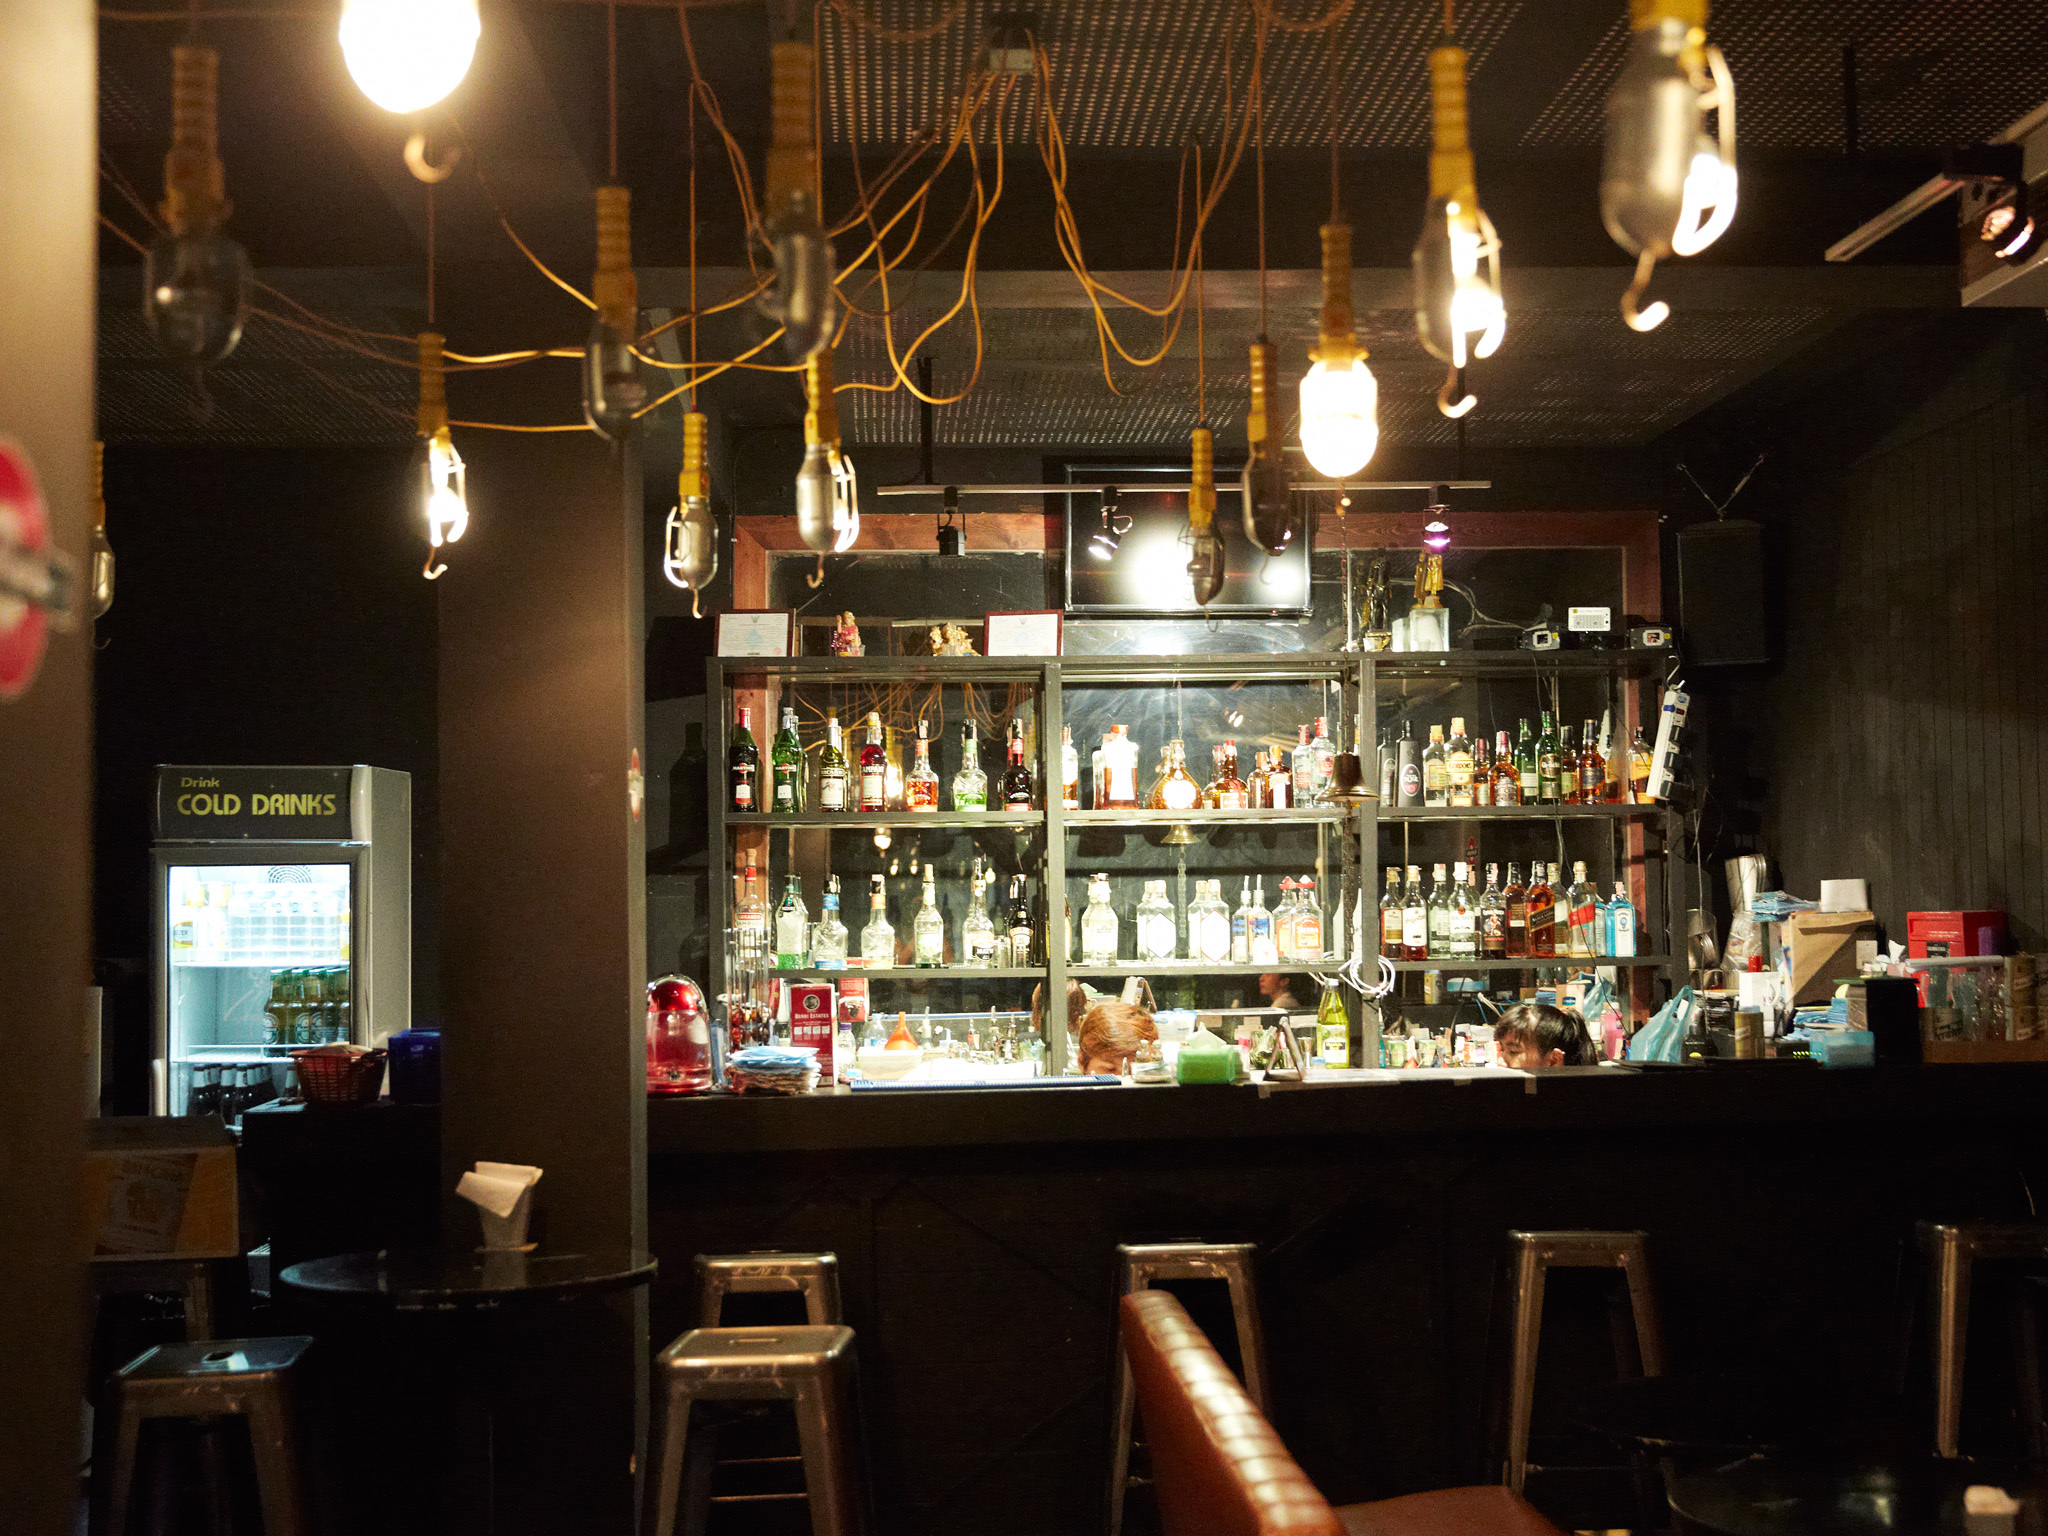 Overground Bar & Cafe